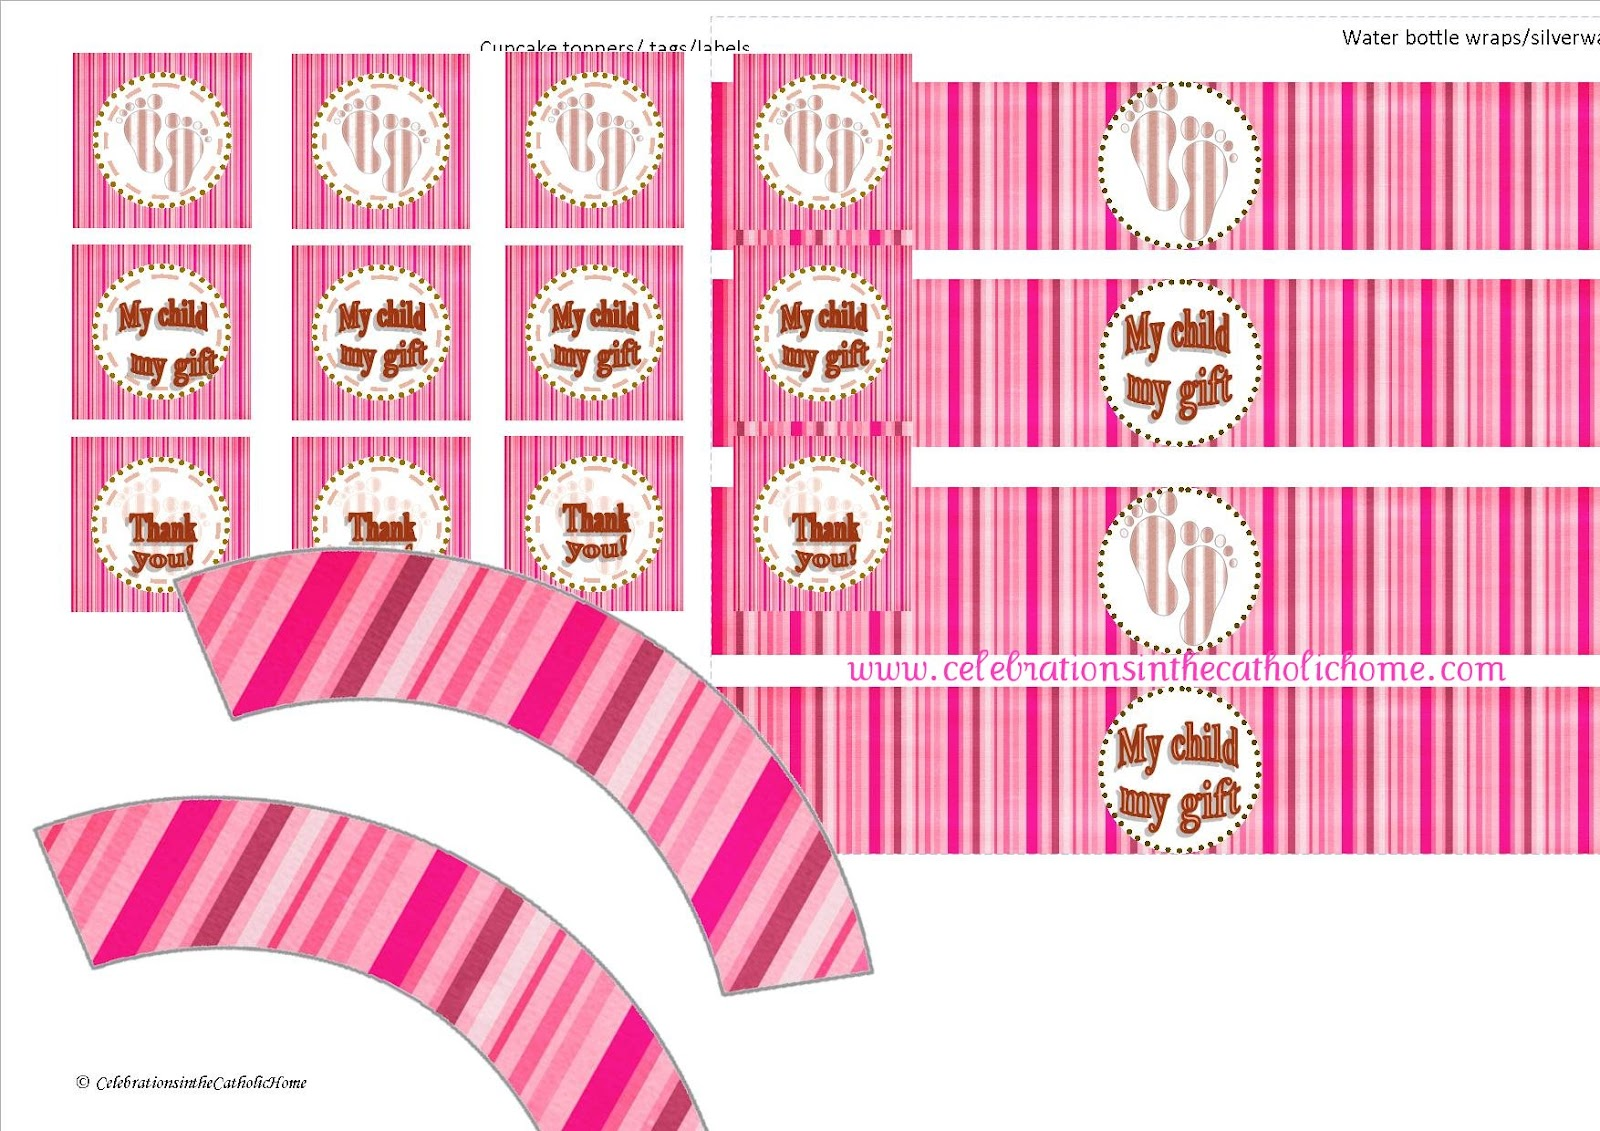 http://2.bp.blogspot.com/-kX23HyhDMVk/TdW73z2OiHI/AAAAAAAAAgA/pj27kJIylPs/s1600/Pink+baby+feet2.jpg